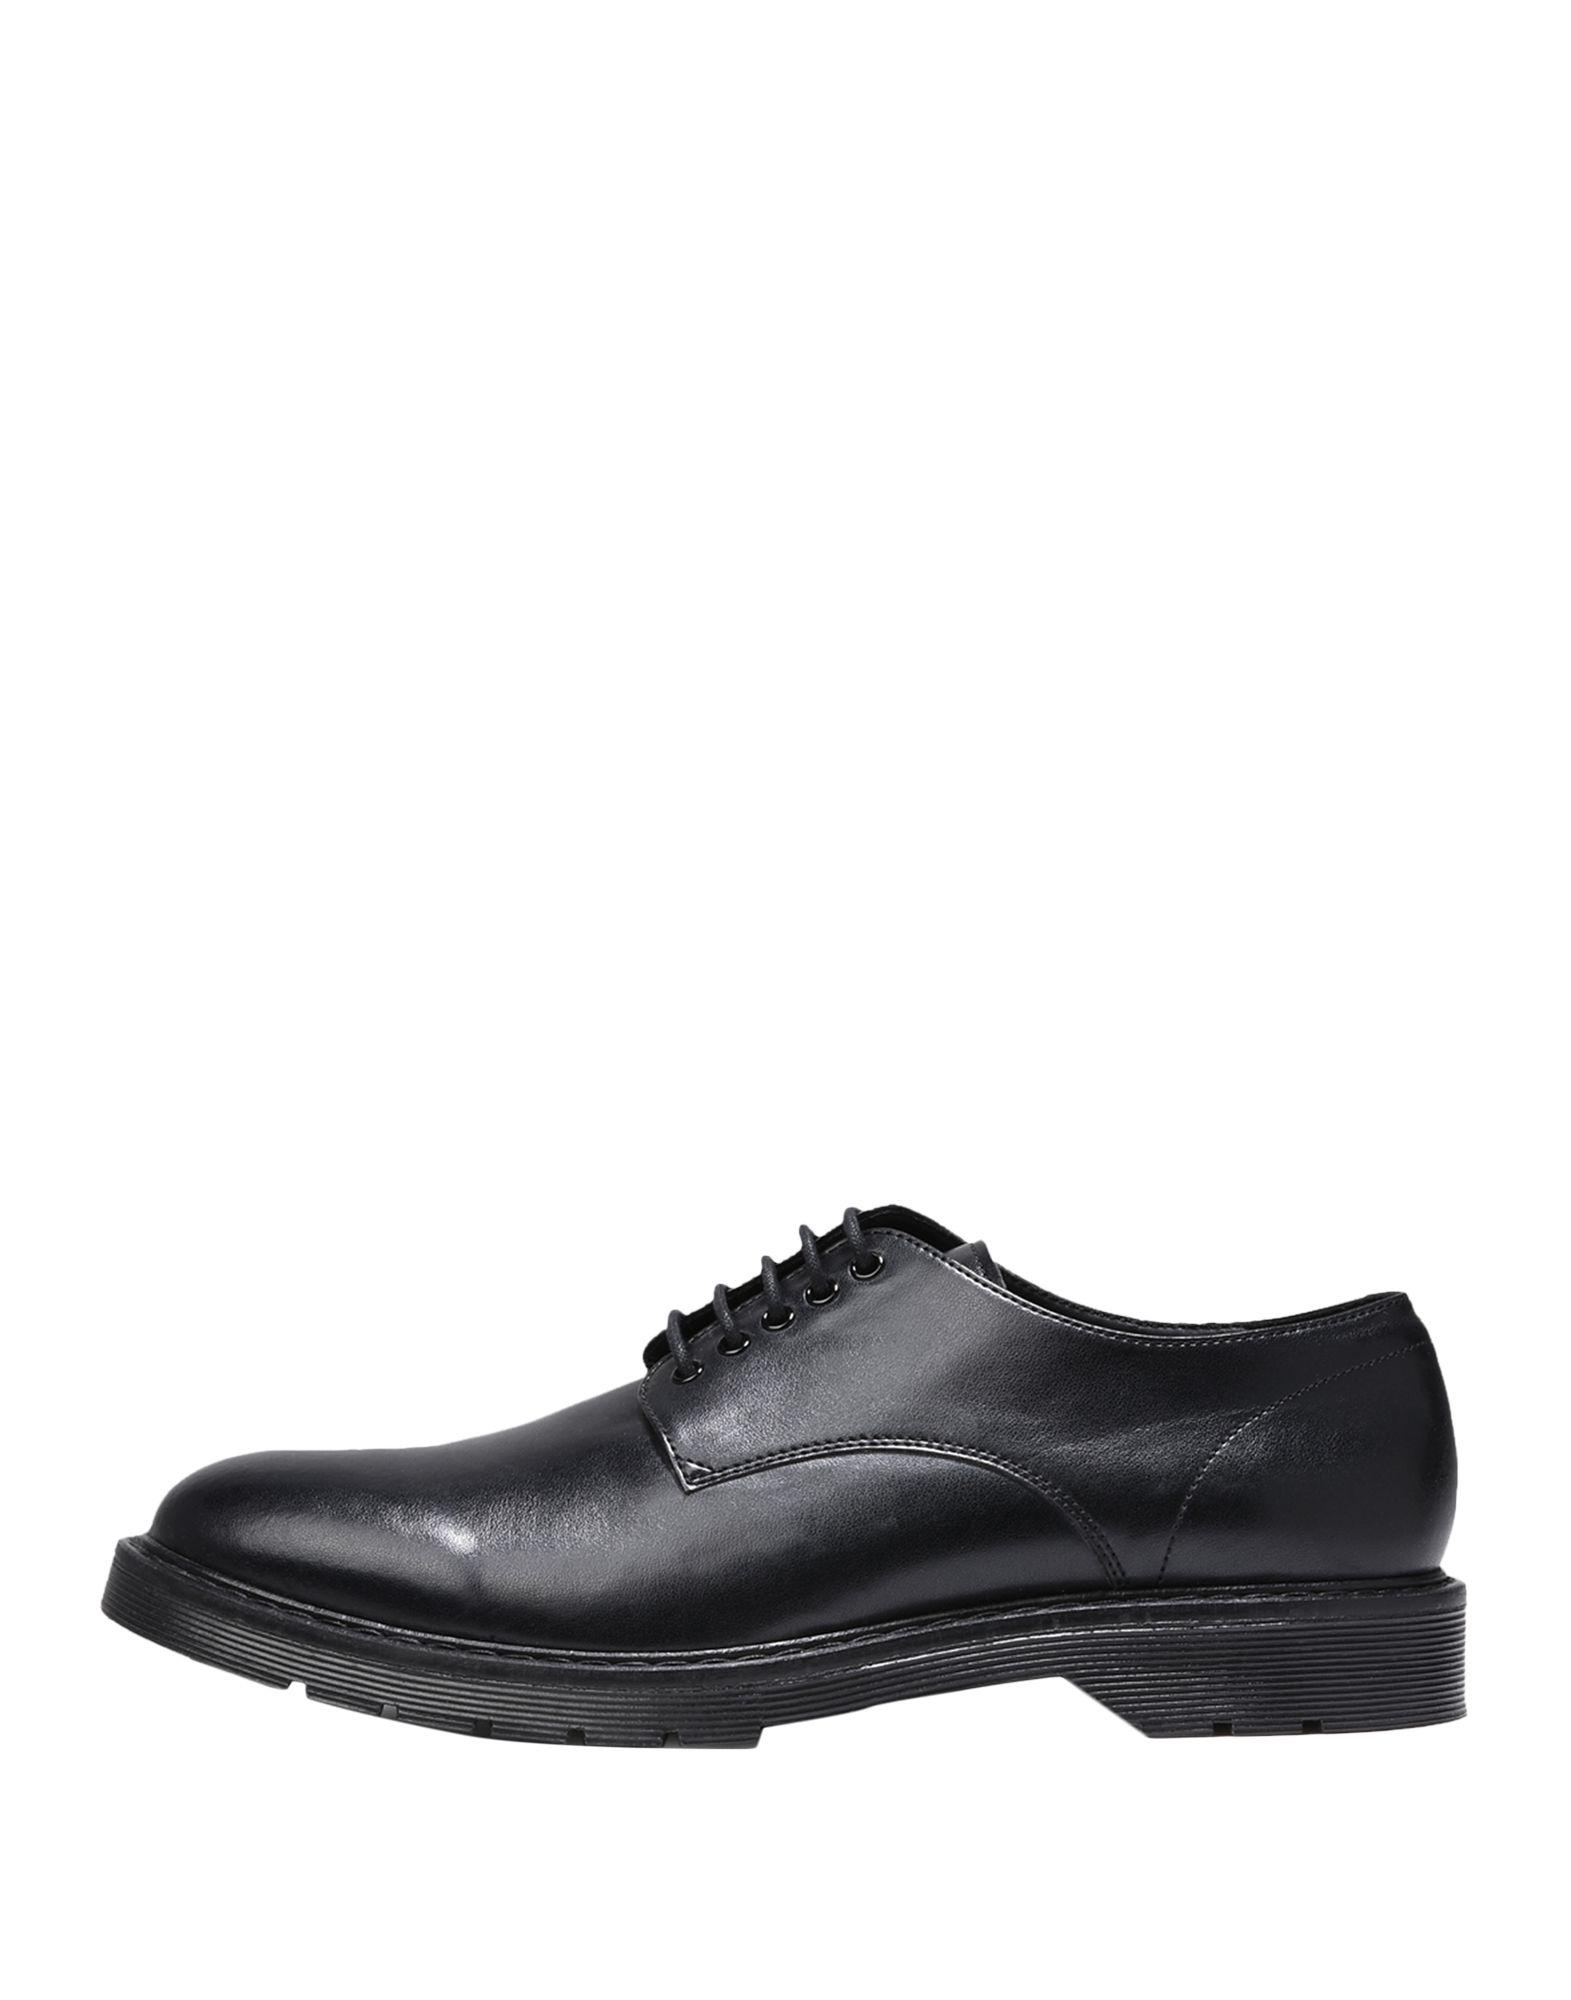 ARMANI EXCHANGE Обувь на шнурках цены онлайн